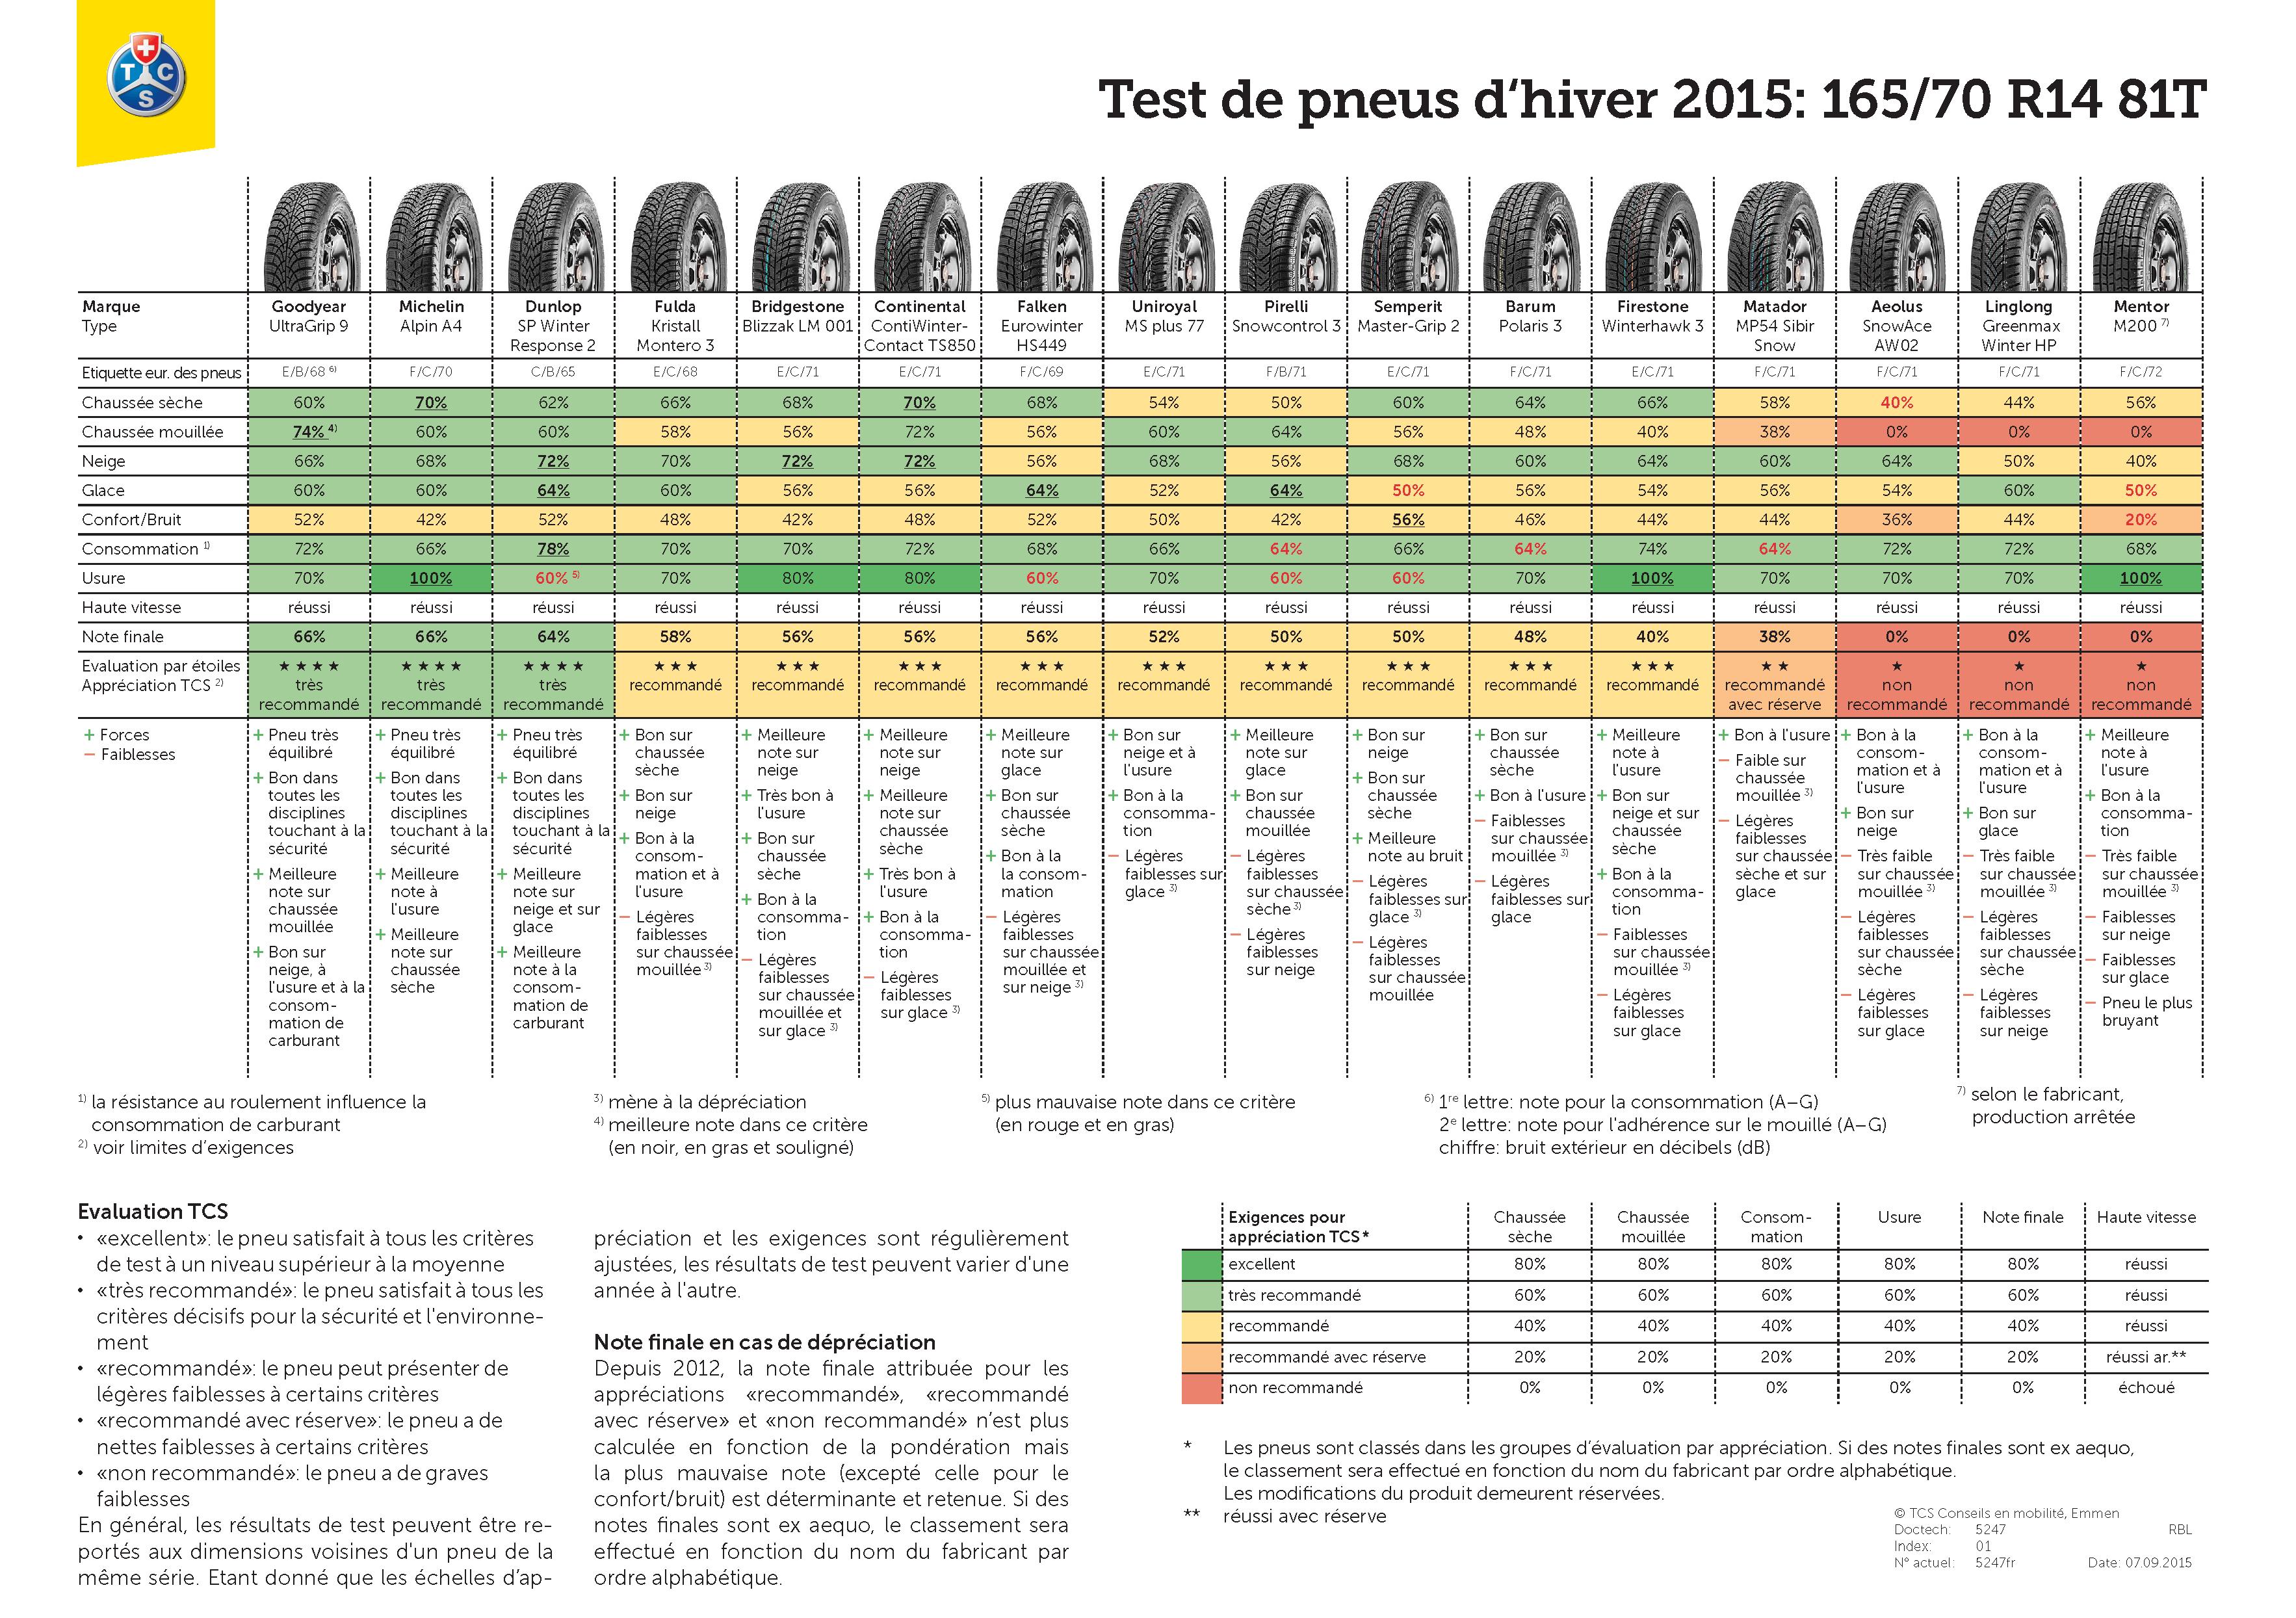 tcs-test-pneus-hiver-2015-resultats-165-70-R14-81T